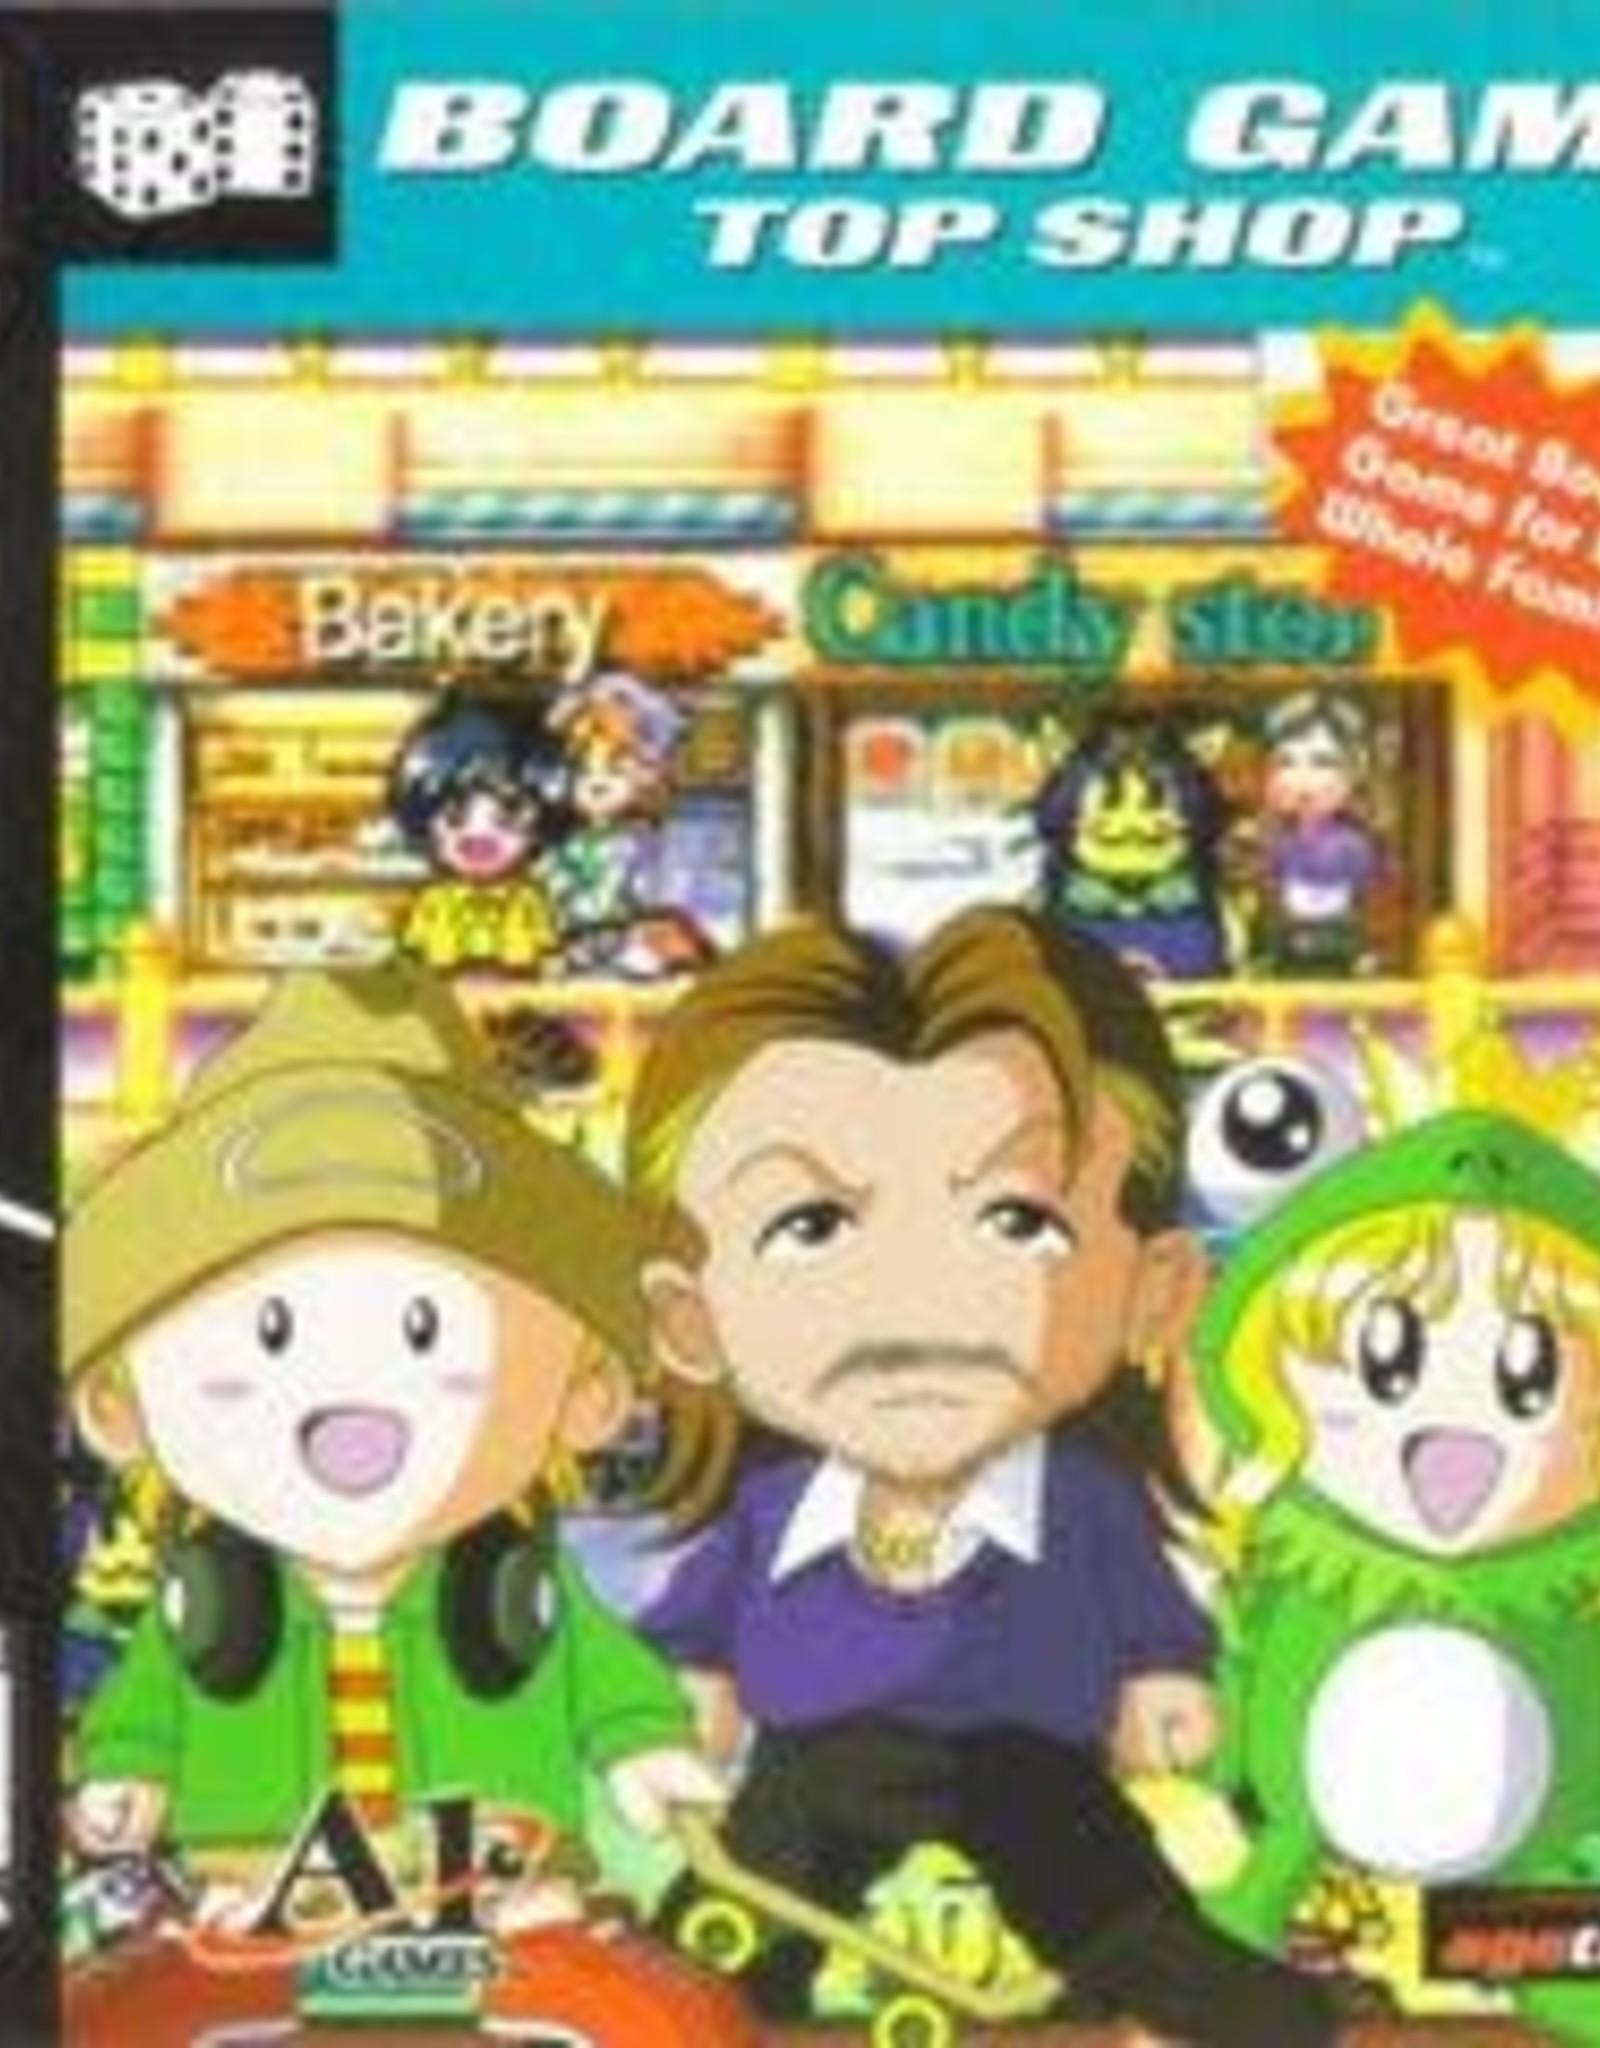 Playstation Board Game Top Shop (No Manual)